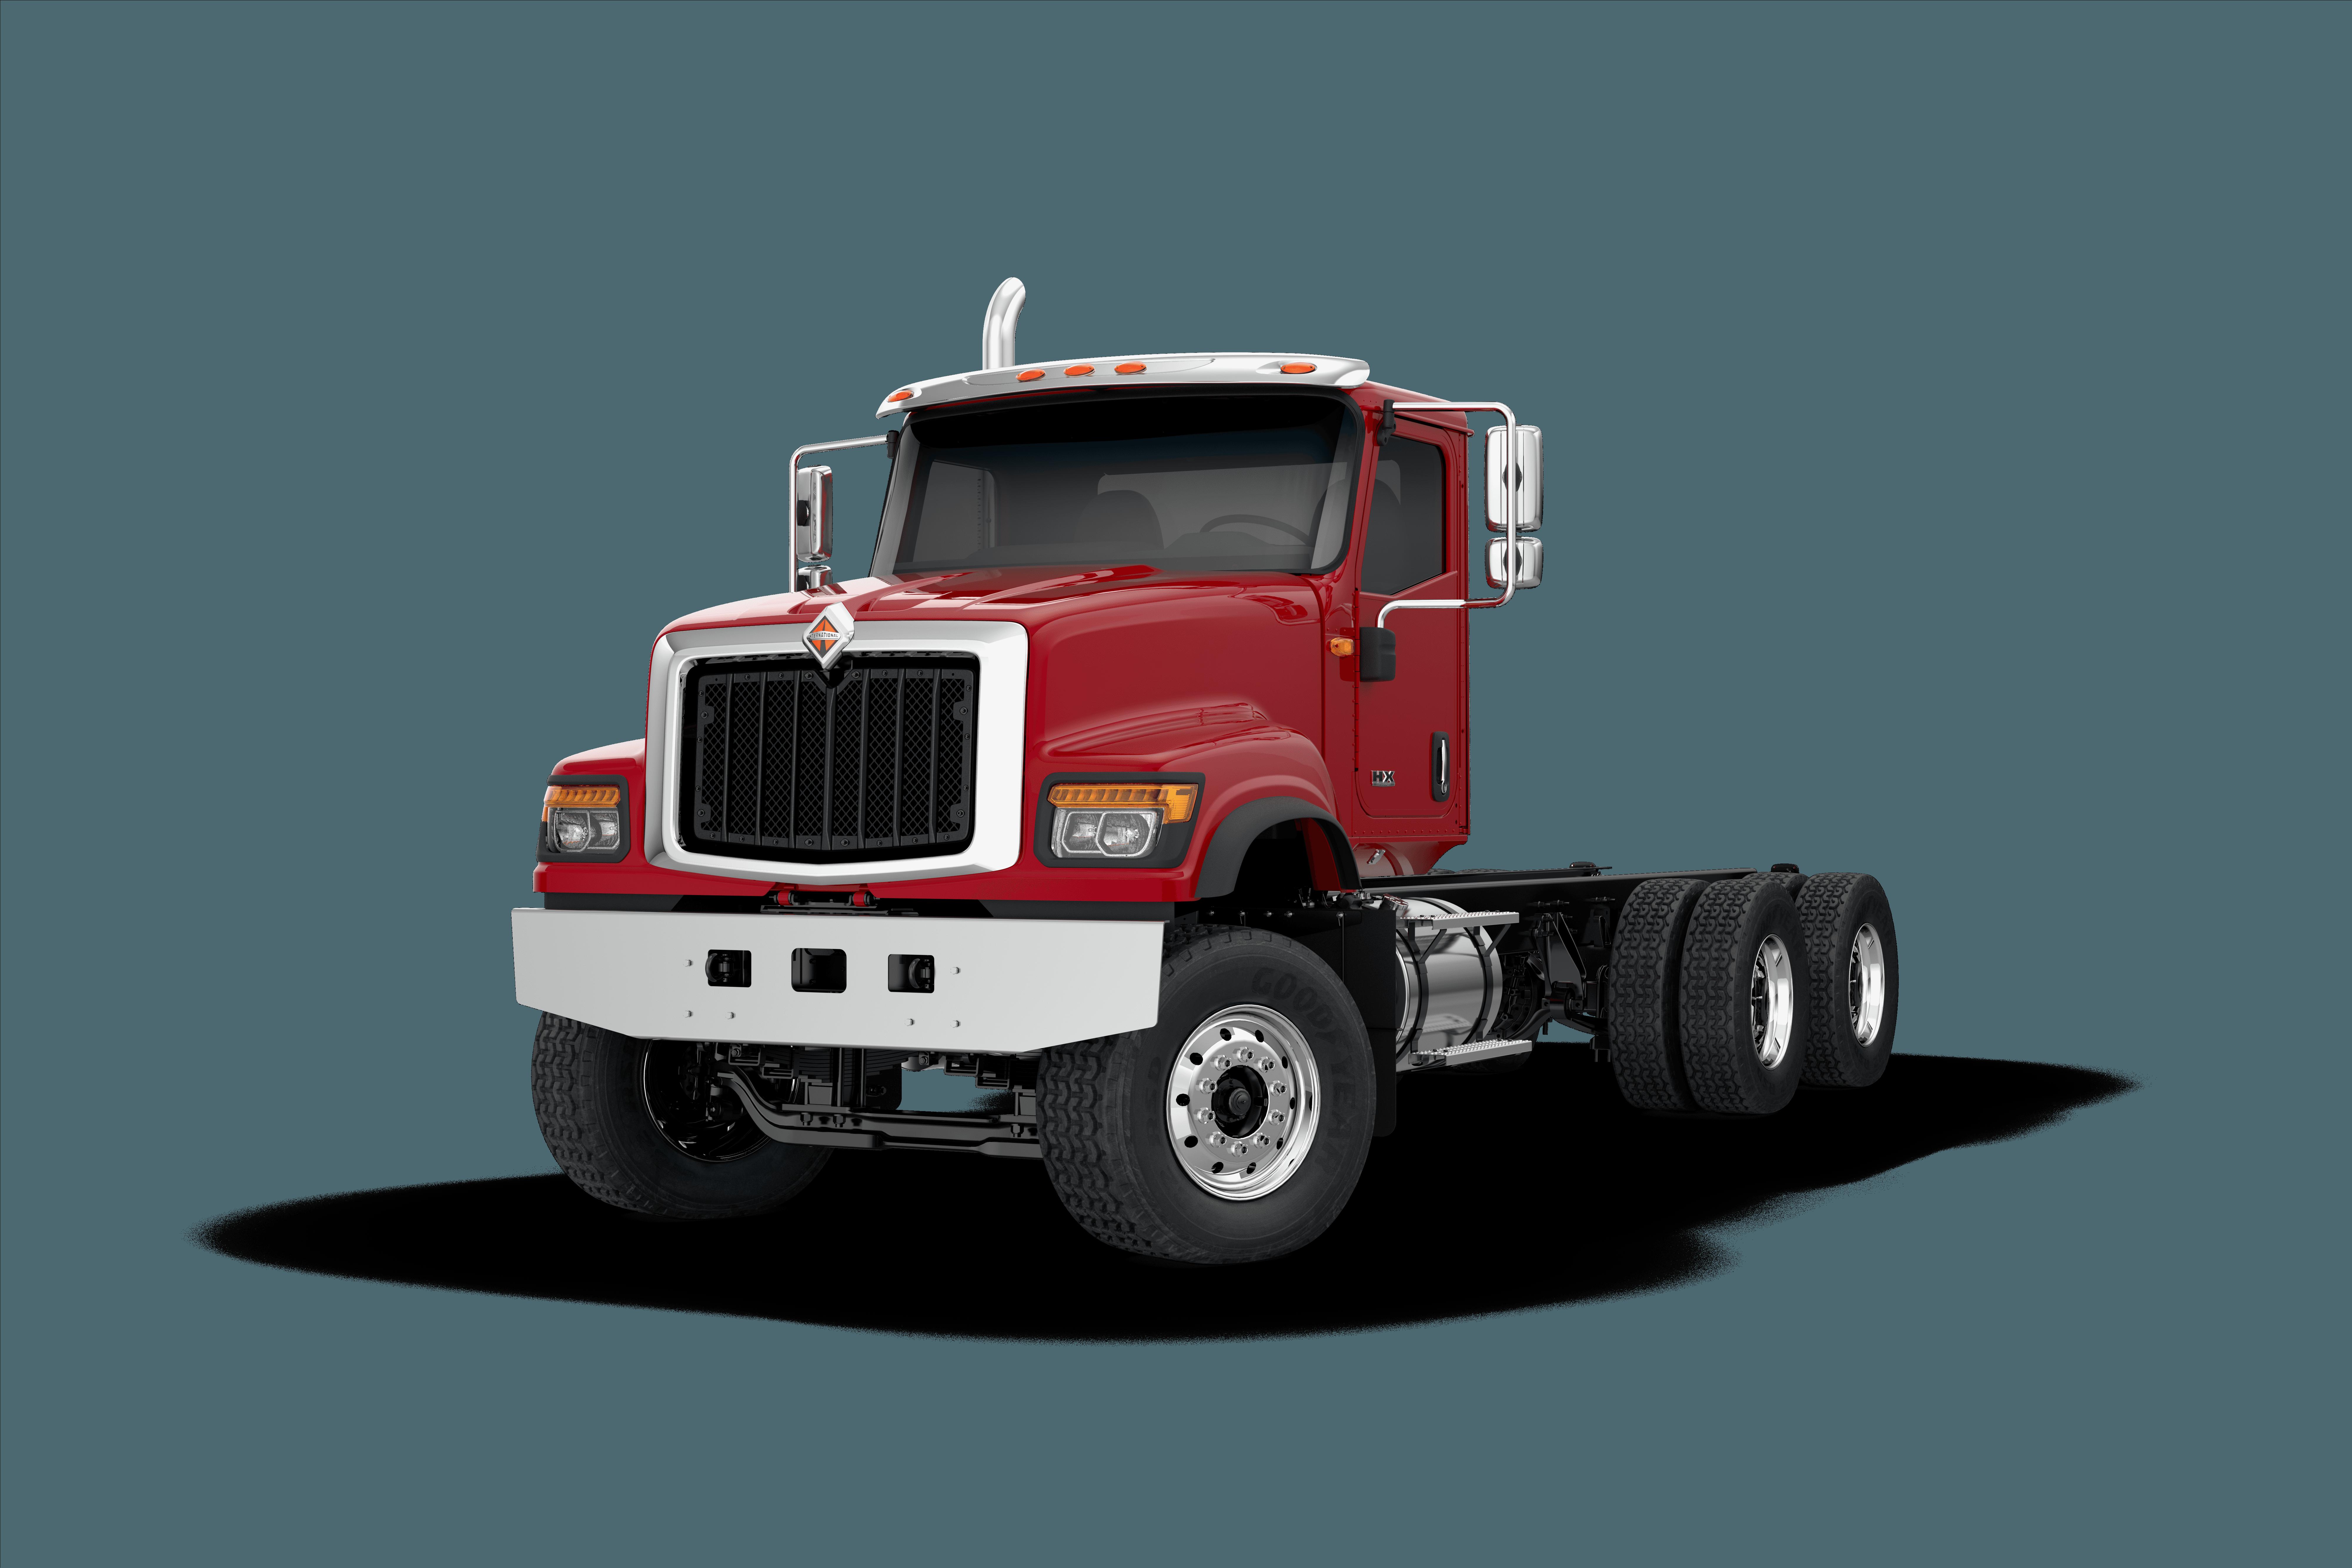 HX 515 SERIES INTERNATIONAL TRUCK